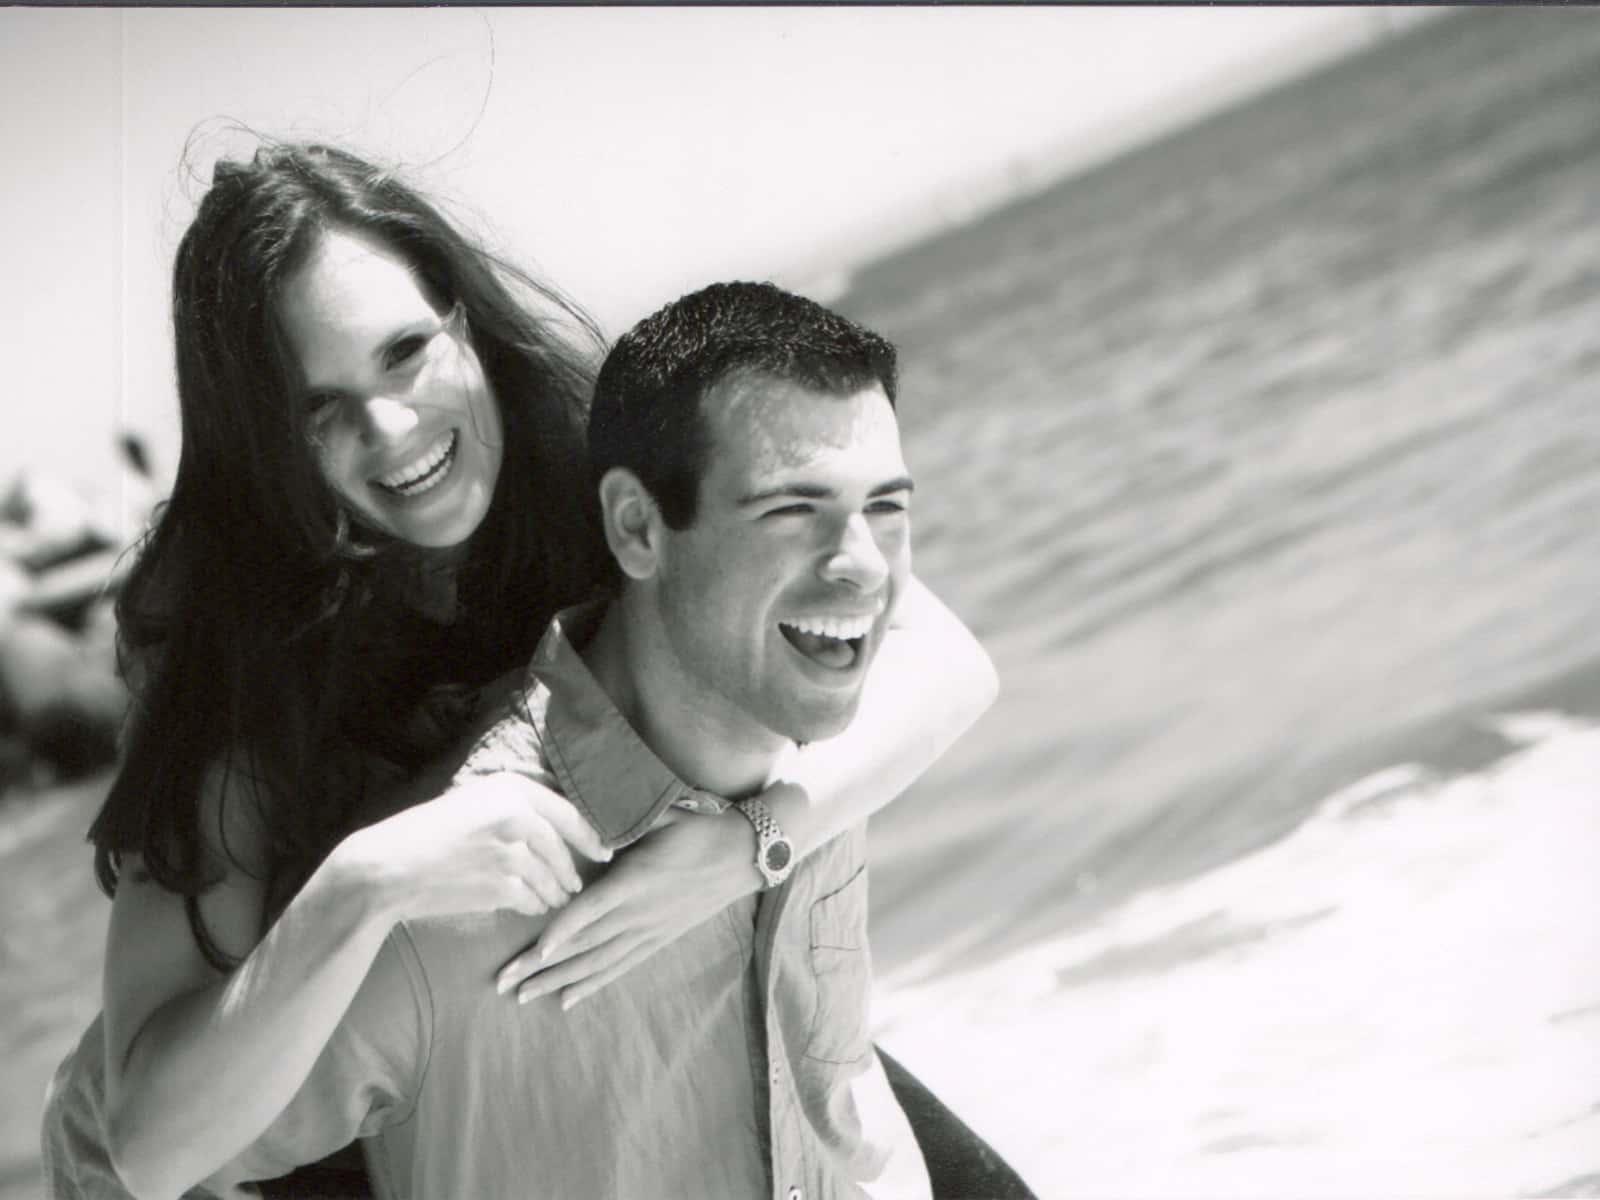 Aaron and rachael & Rachael from Puerto Vallarta, Mexico